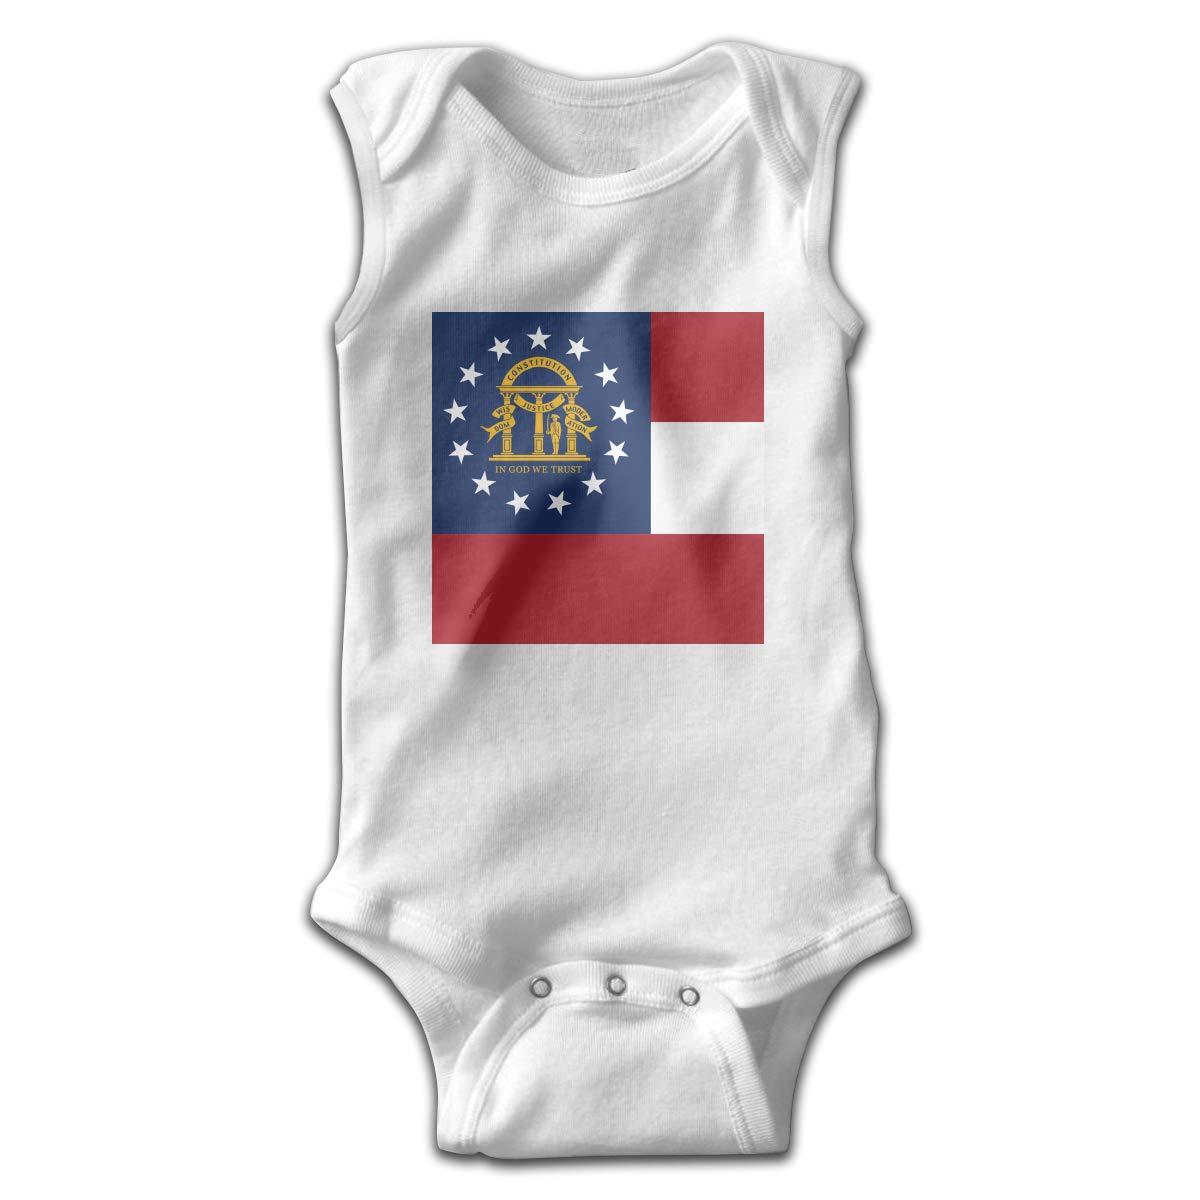 Georgia State Flag Newborn Baby No Sleeve Bodysuit Romper Infant Summer Clothing Black